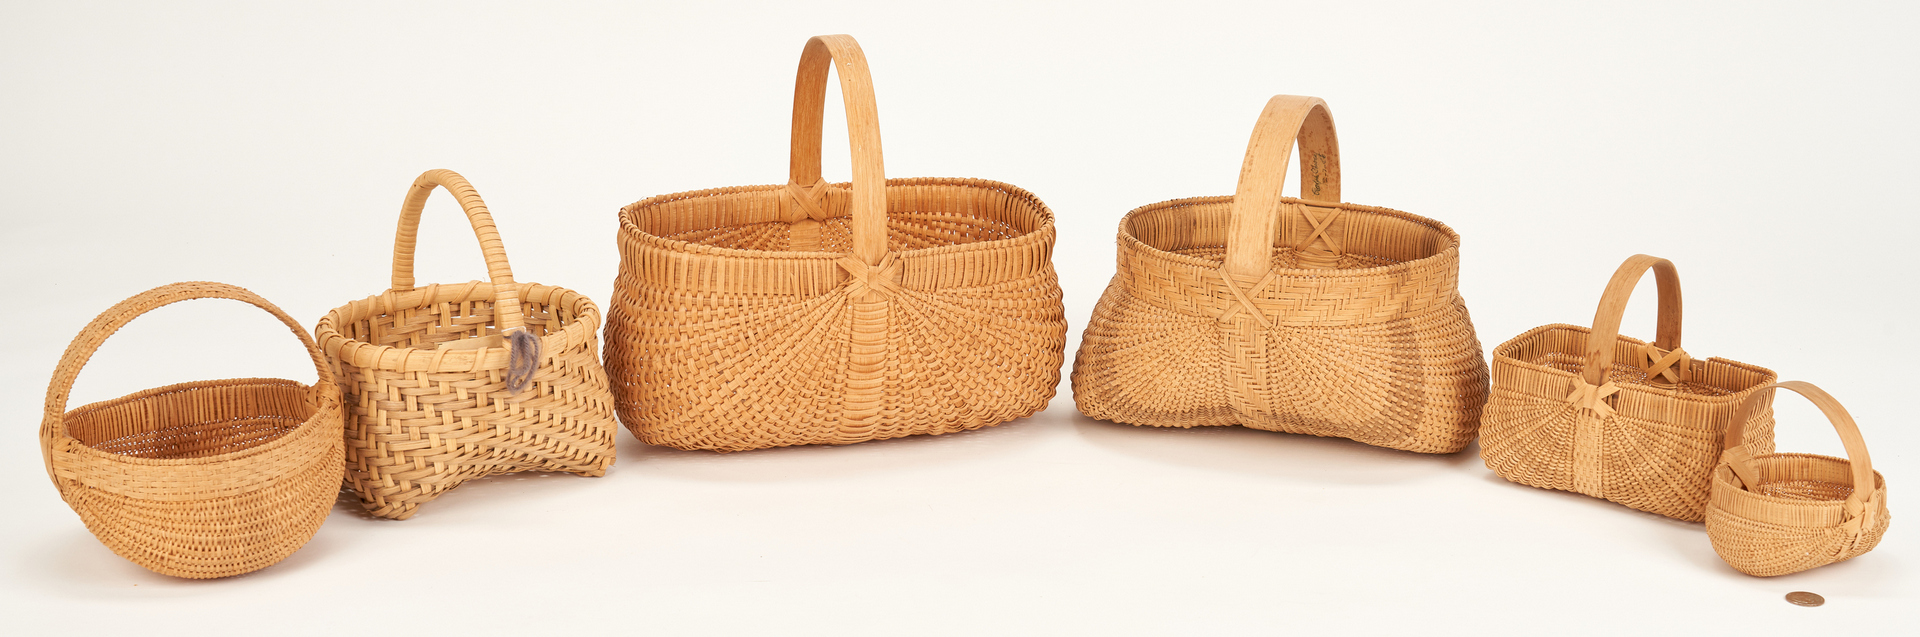 Lot 888: 6 Baskets incl. 2 Prater Family Baskets